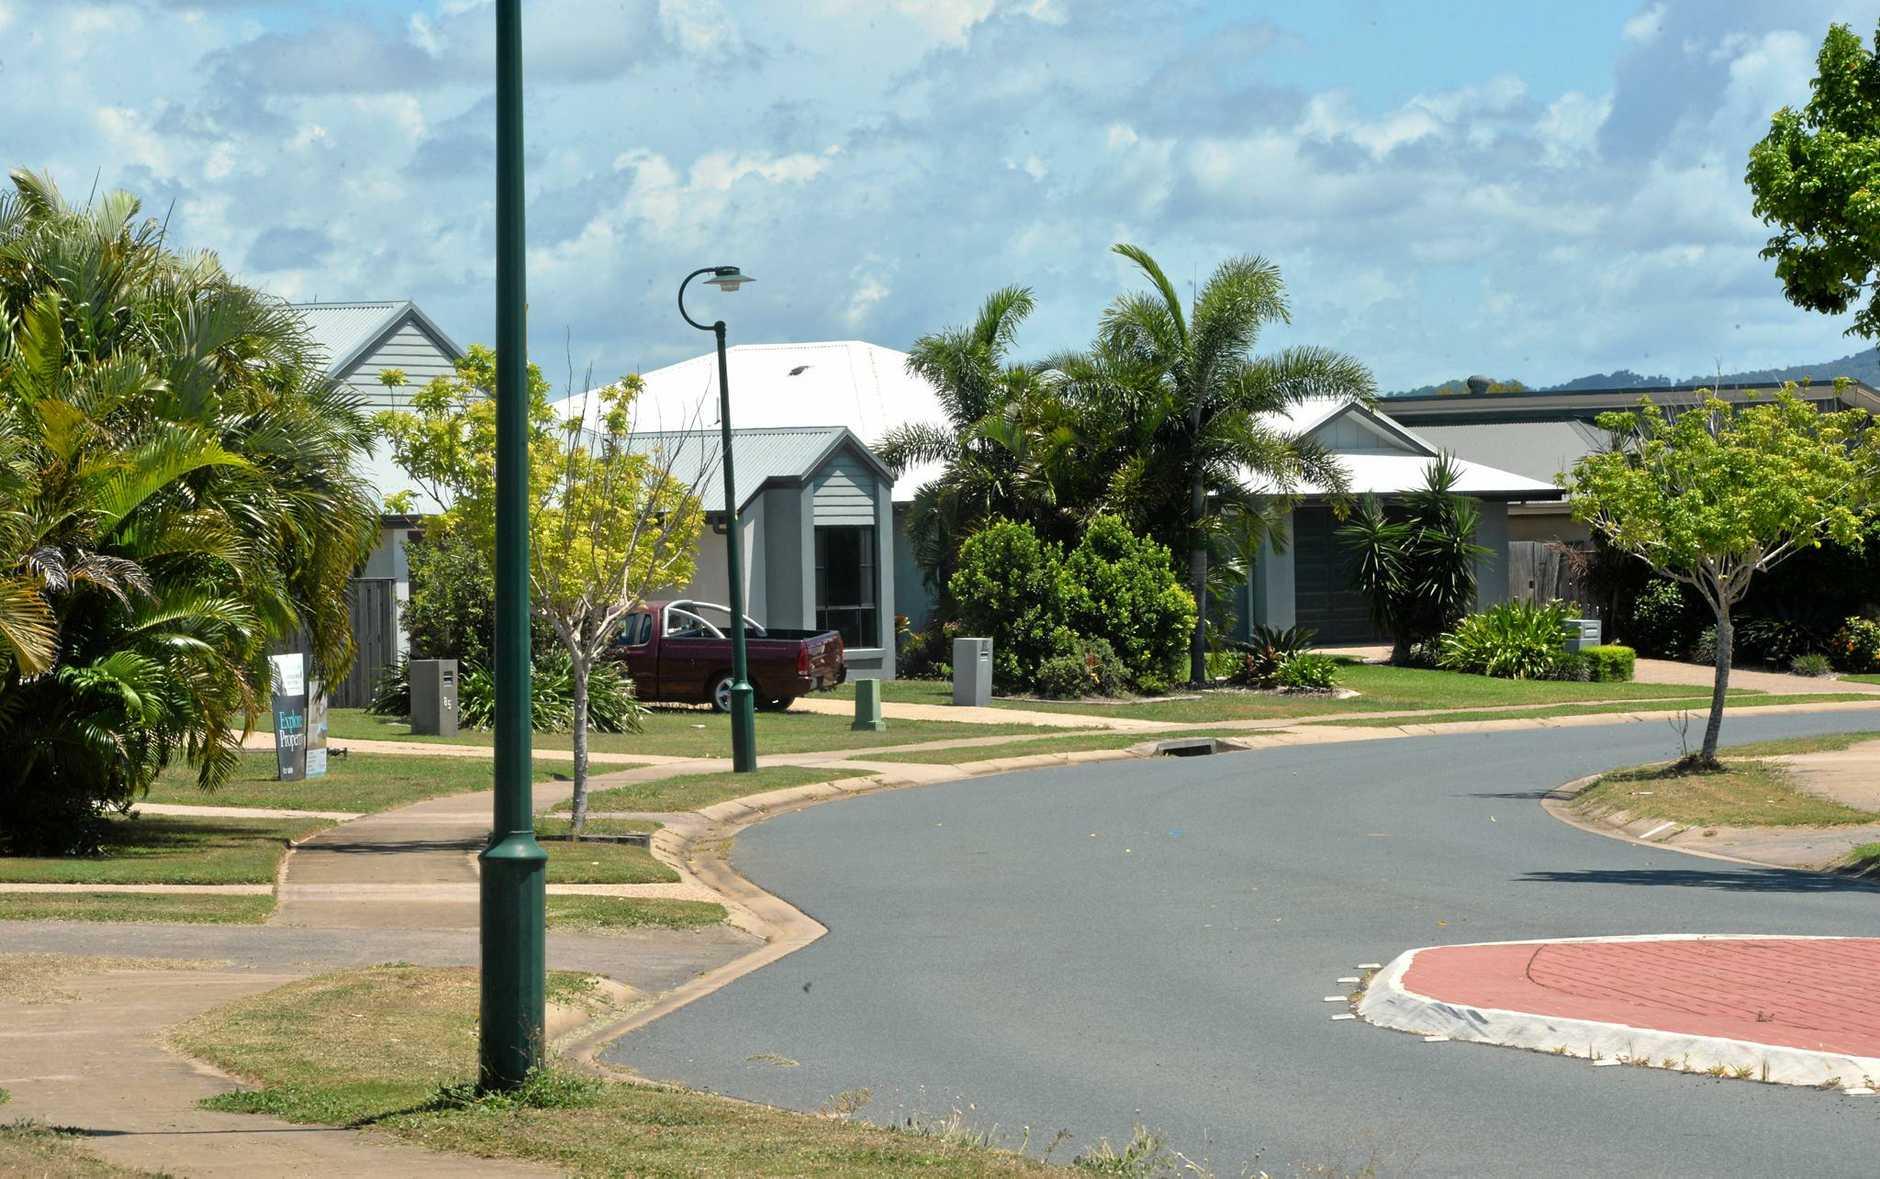 Whitehaven Drive in Blacks Beach Cove